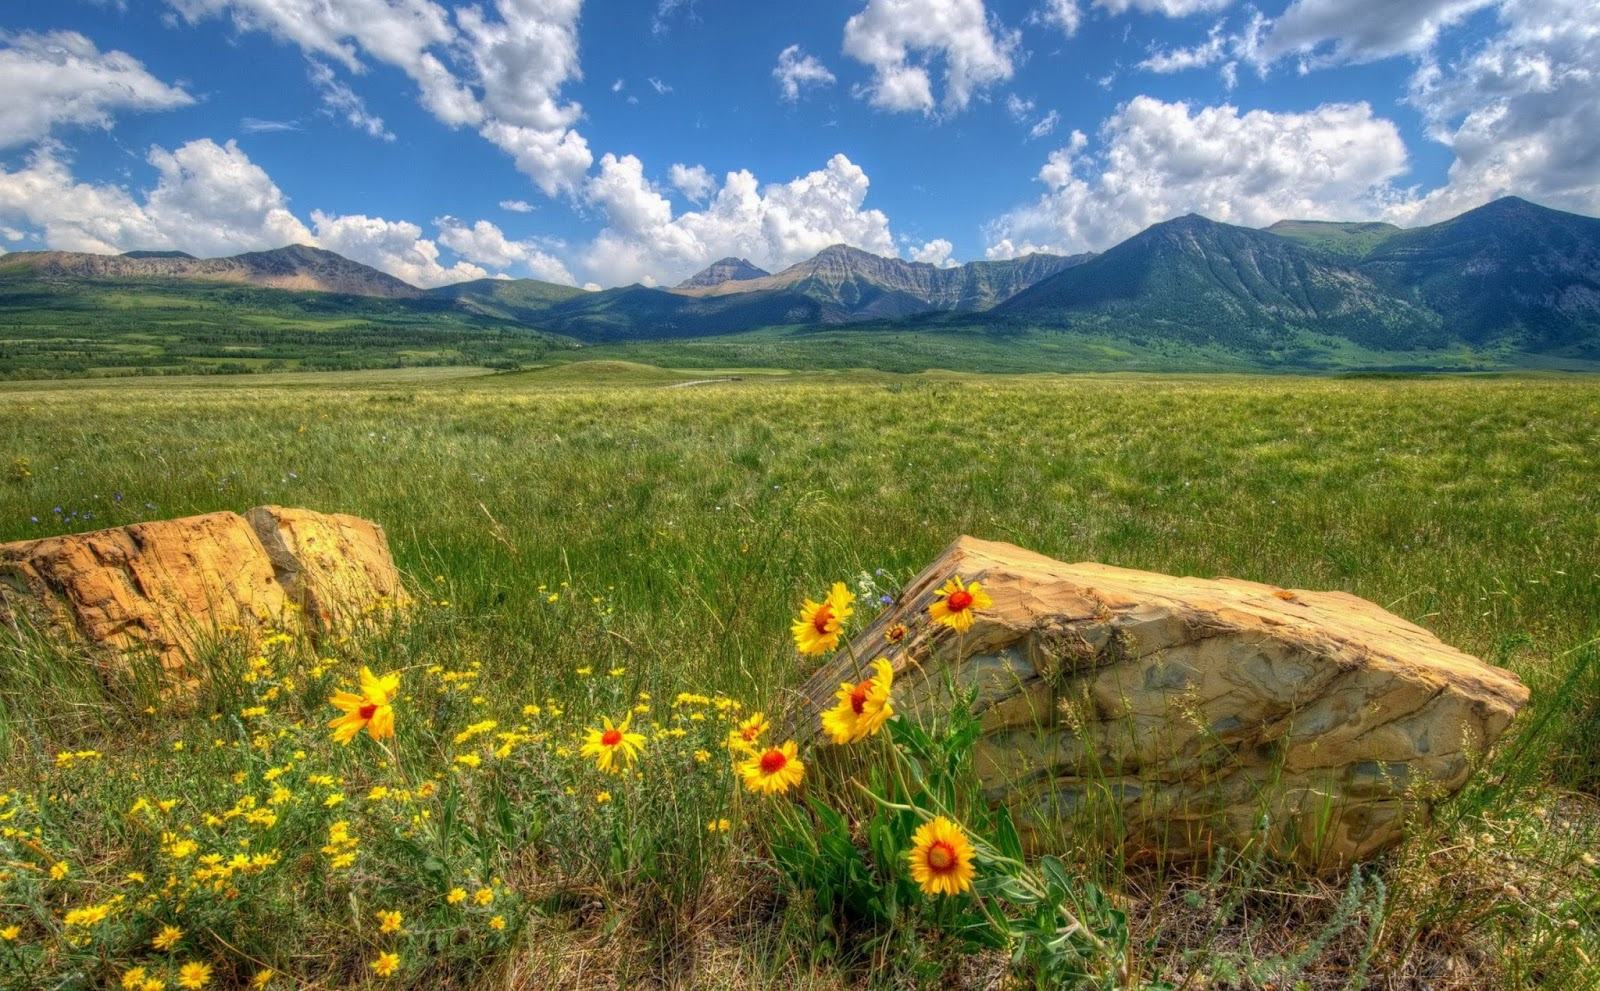 Im genes arte pinturas paisajes naturales im genes - Imagenes de paisajes ...